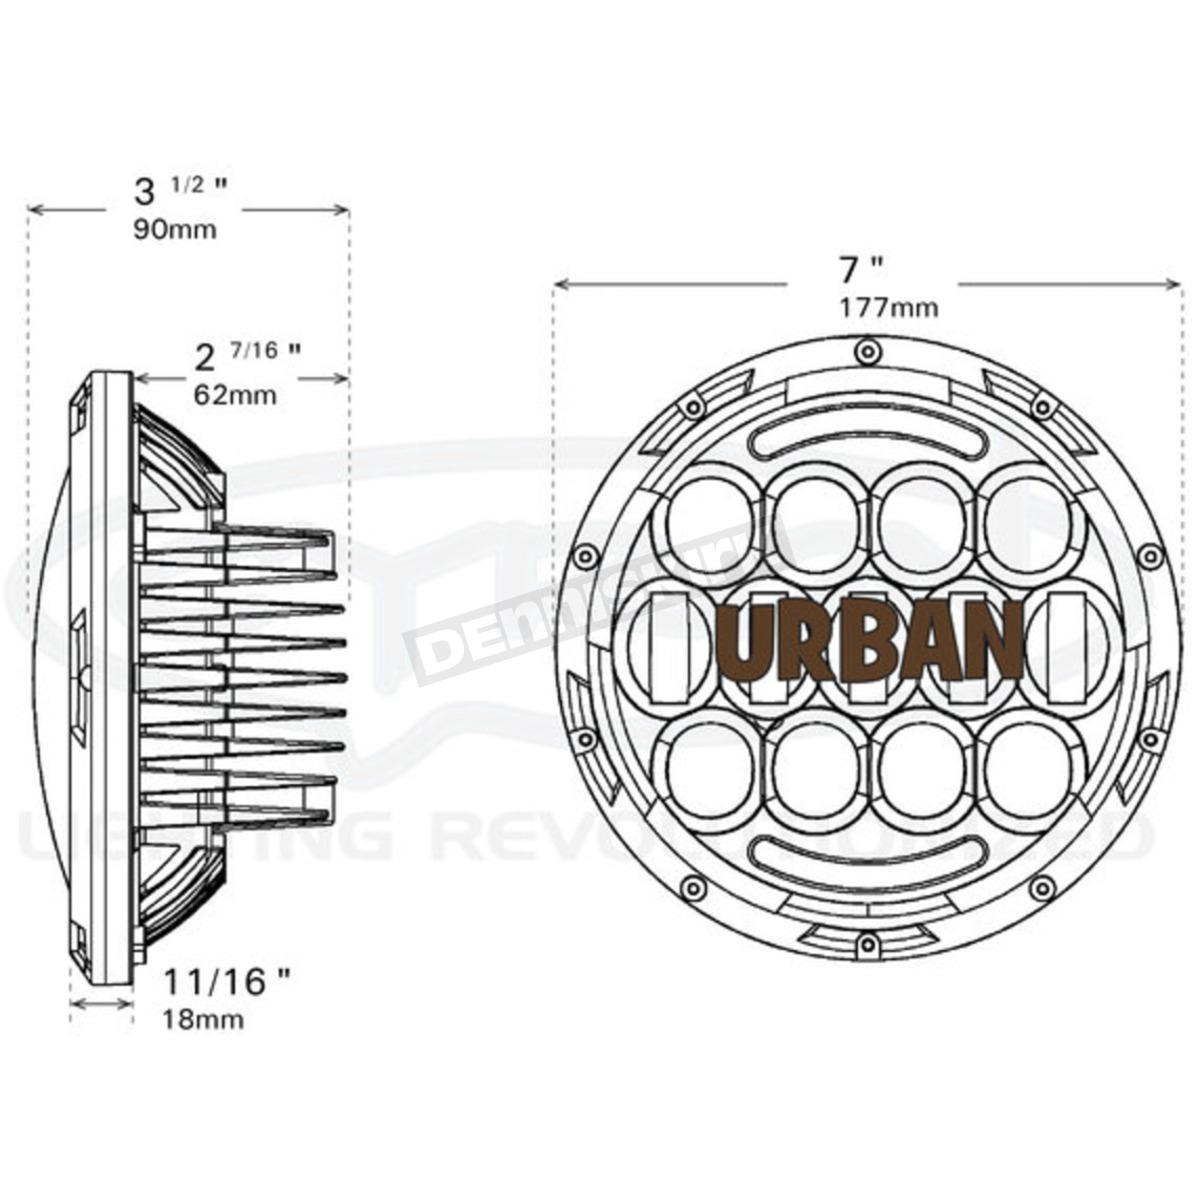 Harley Davidson Fatboy Wiring Diagram